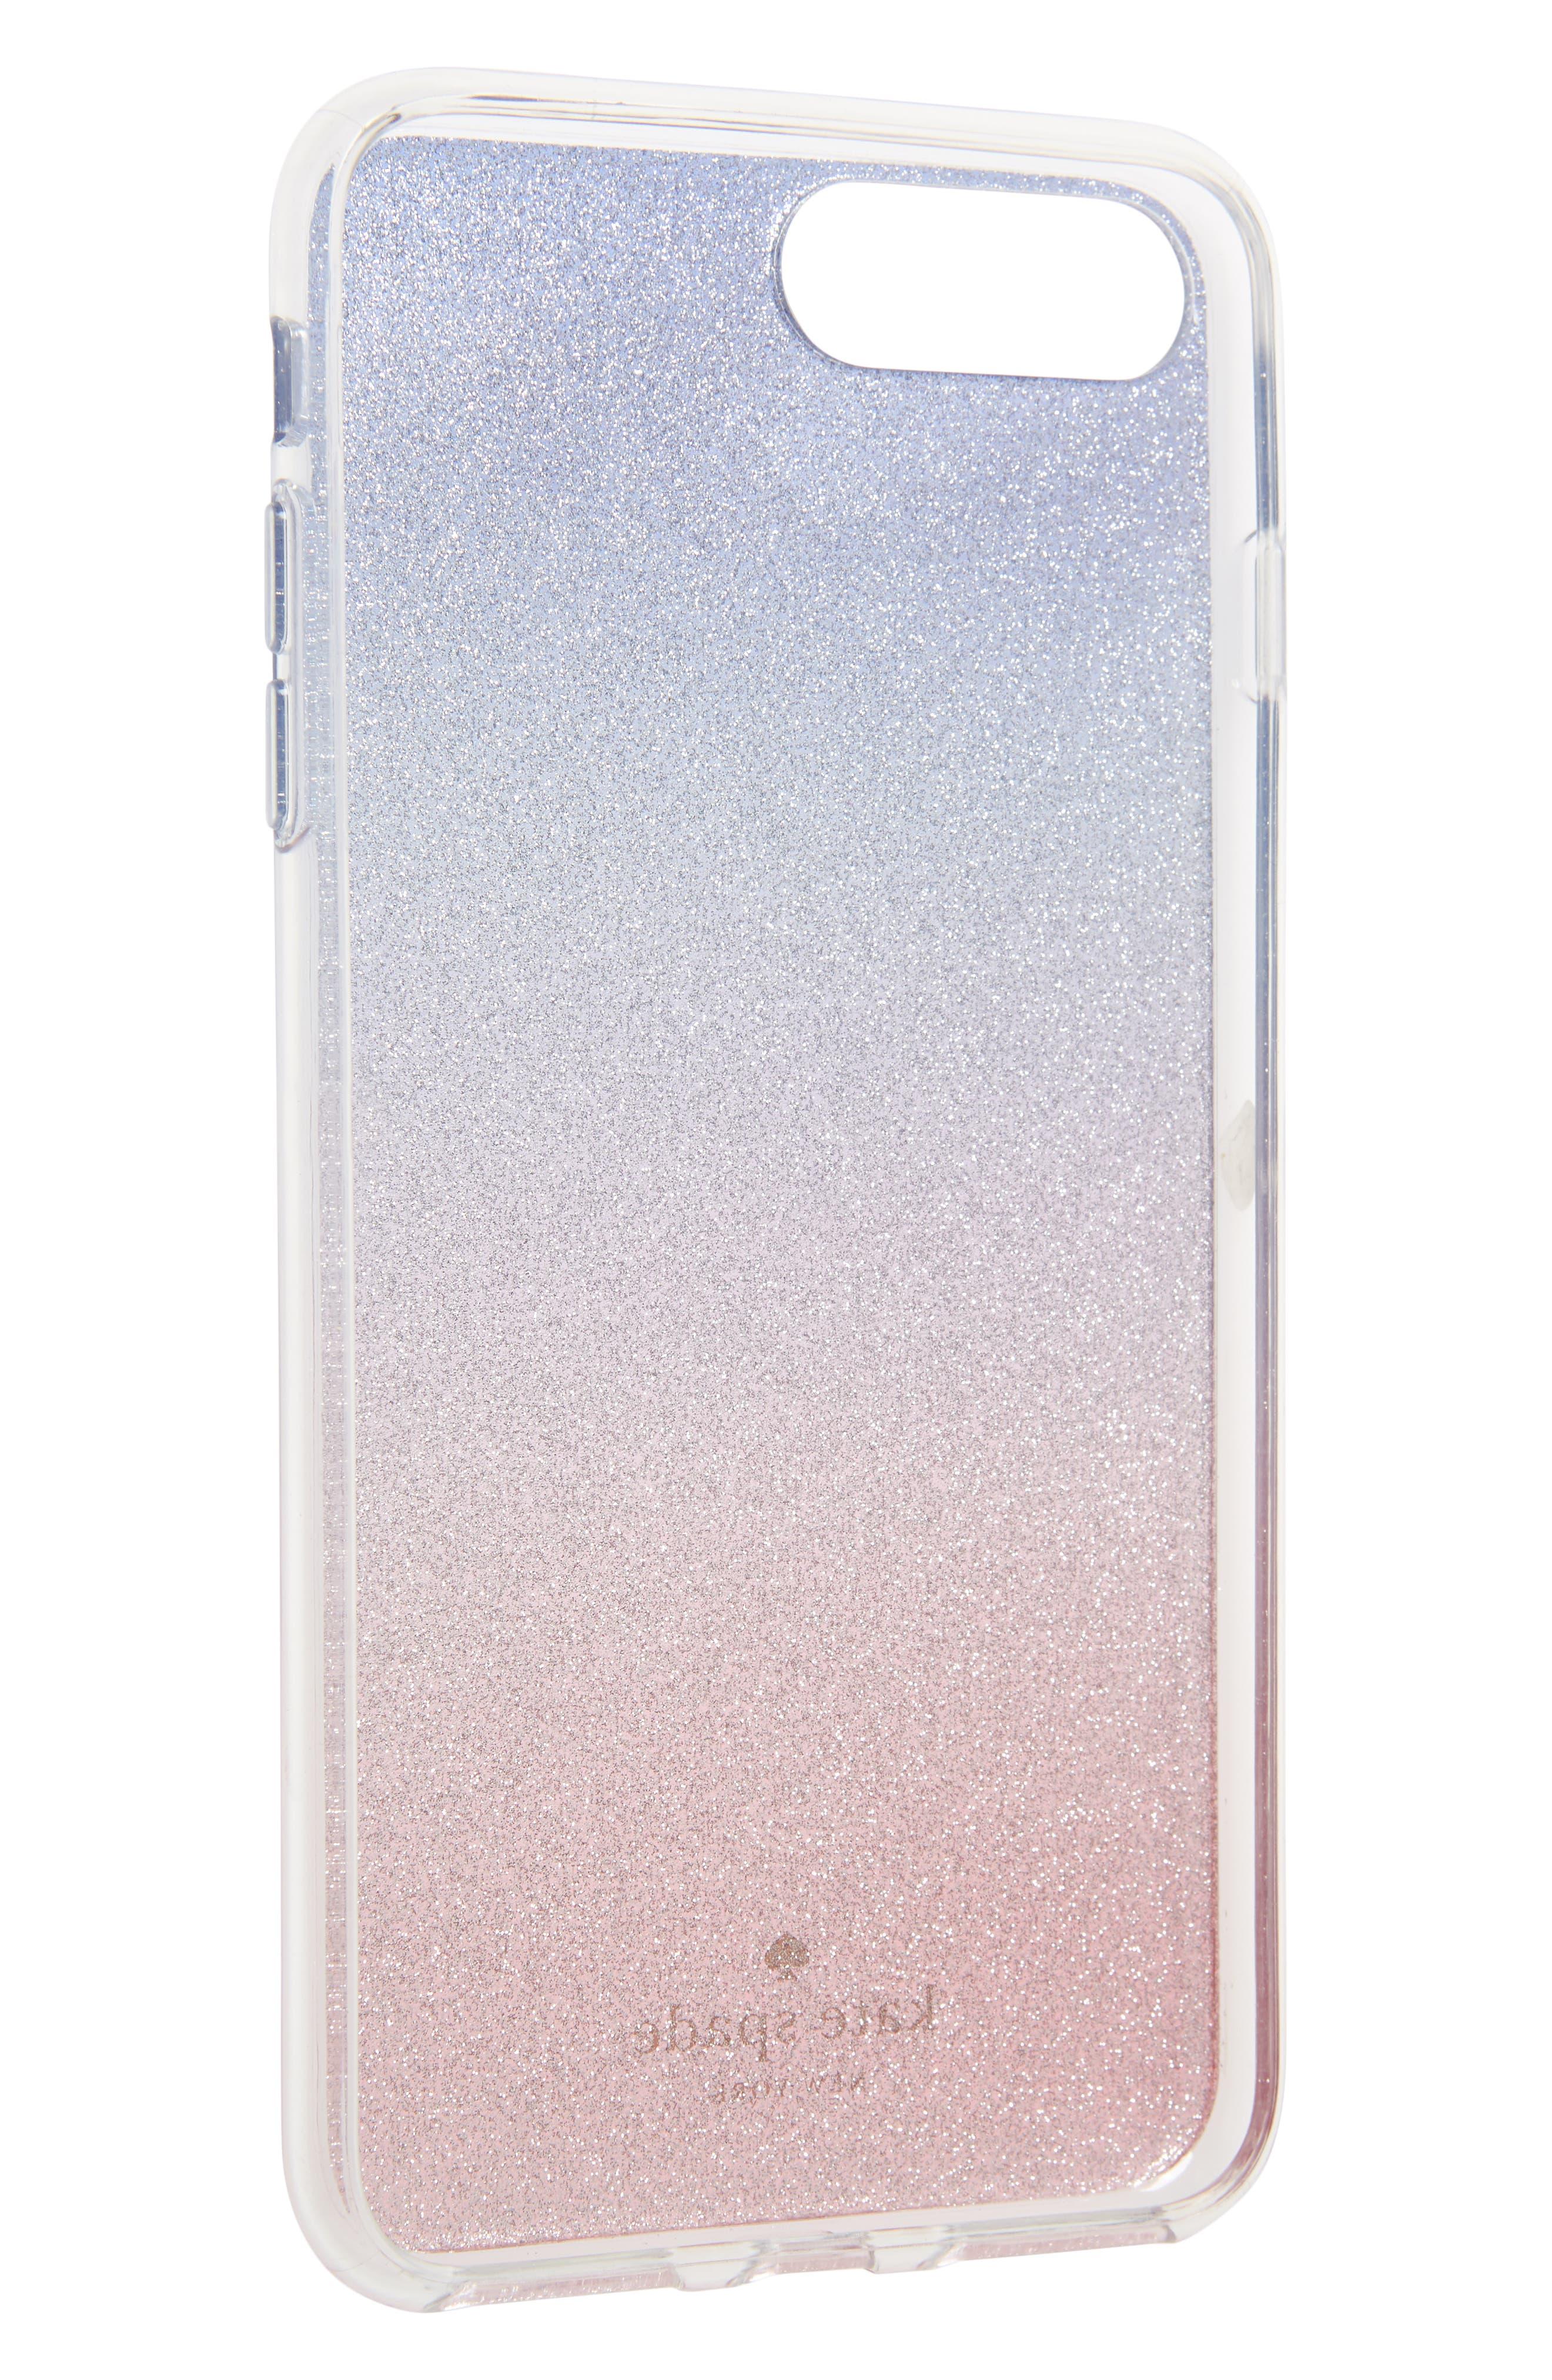 ombré sunset glitter iPhone 7/8 & 7/8 Plus case,                             Alternate thumbnail 2, color,                             Pink Multi